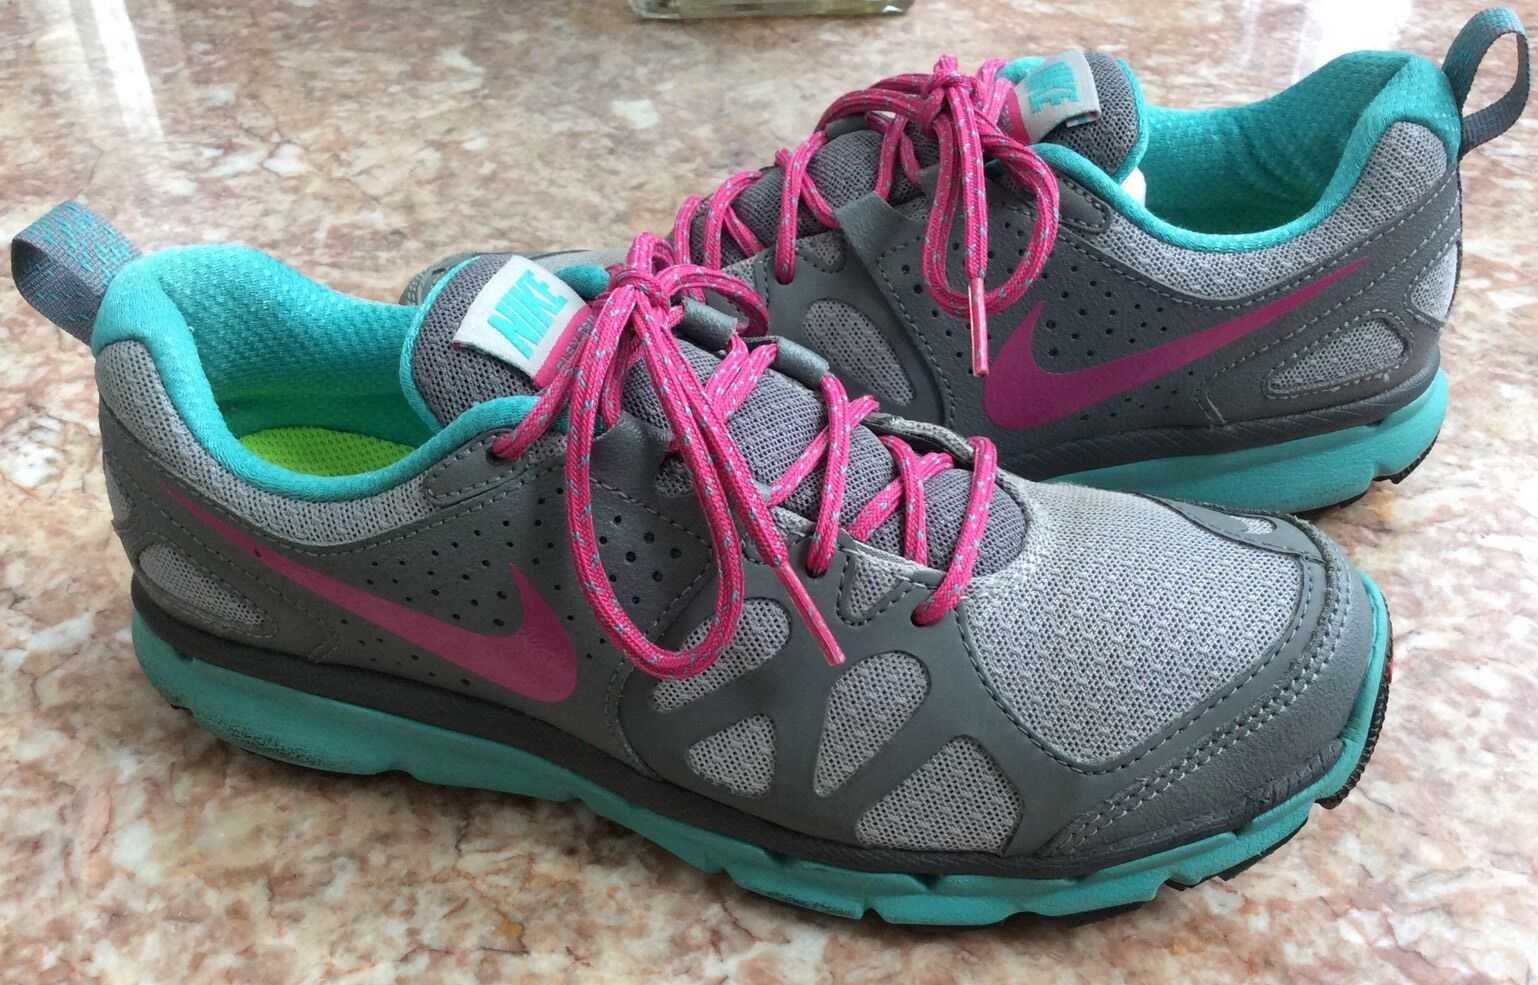 NIke Flex Trail Women's Gray Turquoise Shoes Size 7.5 EUC